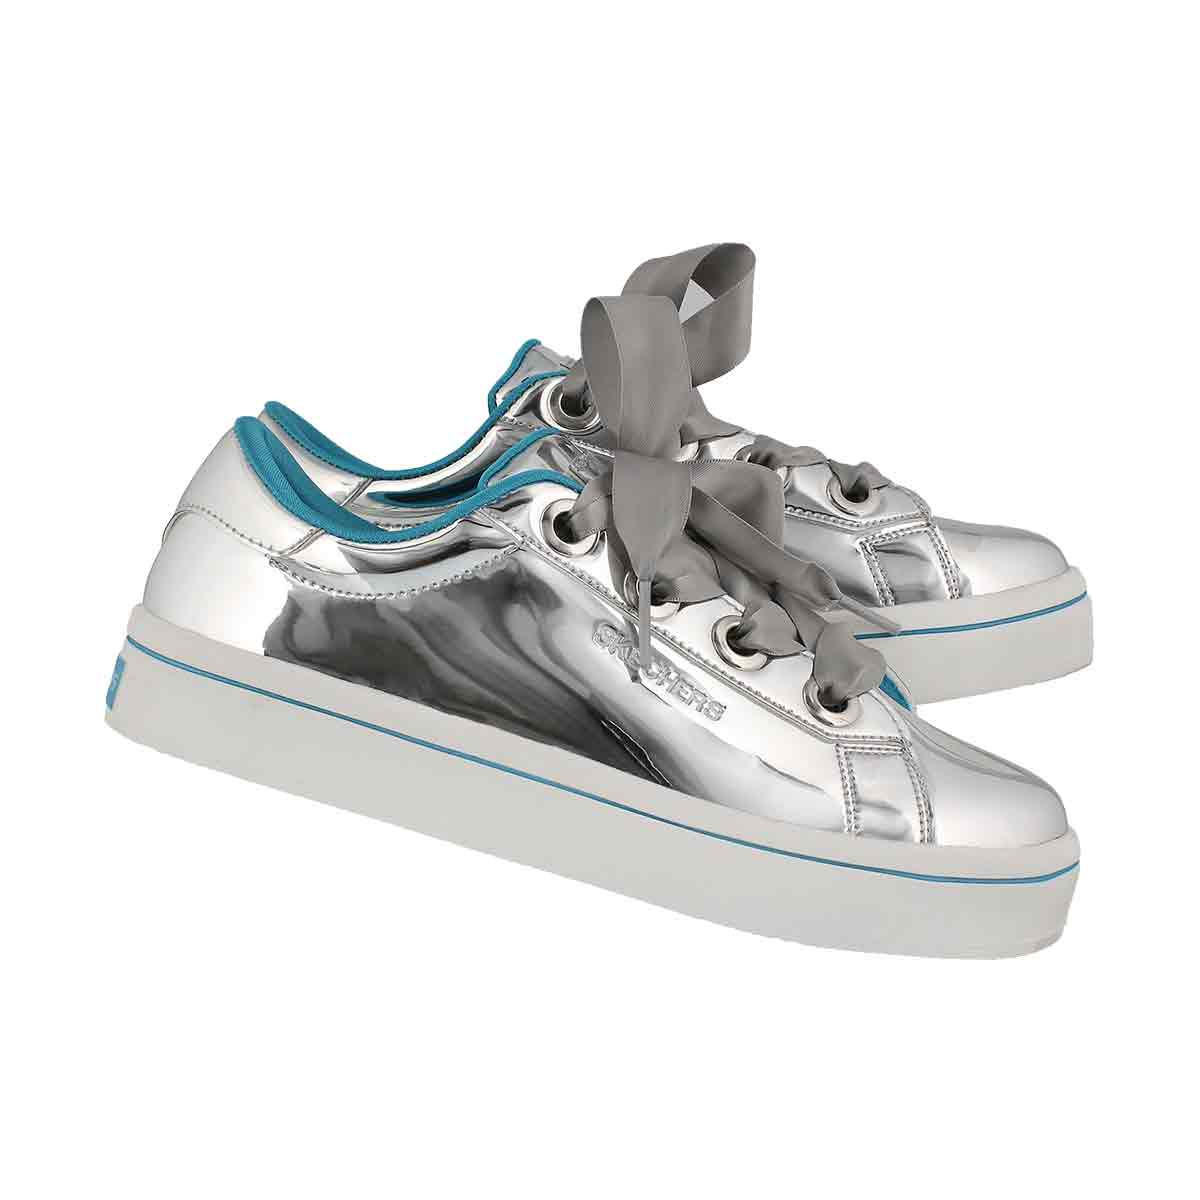 Grls Hi-Lite Liquid Bling silver sneaker